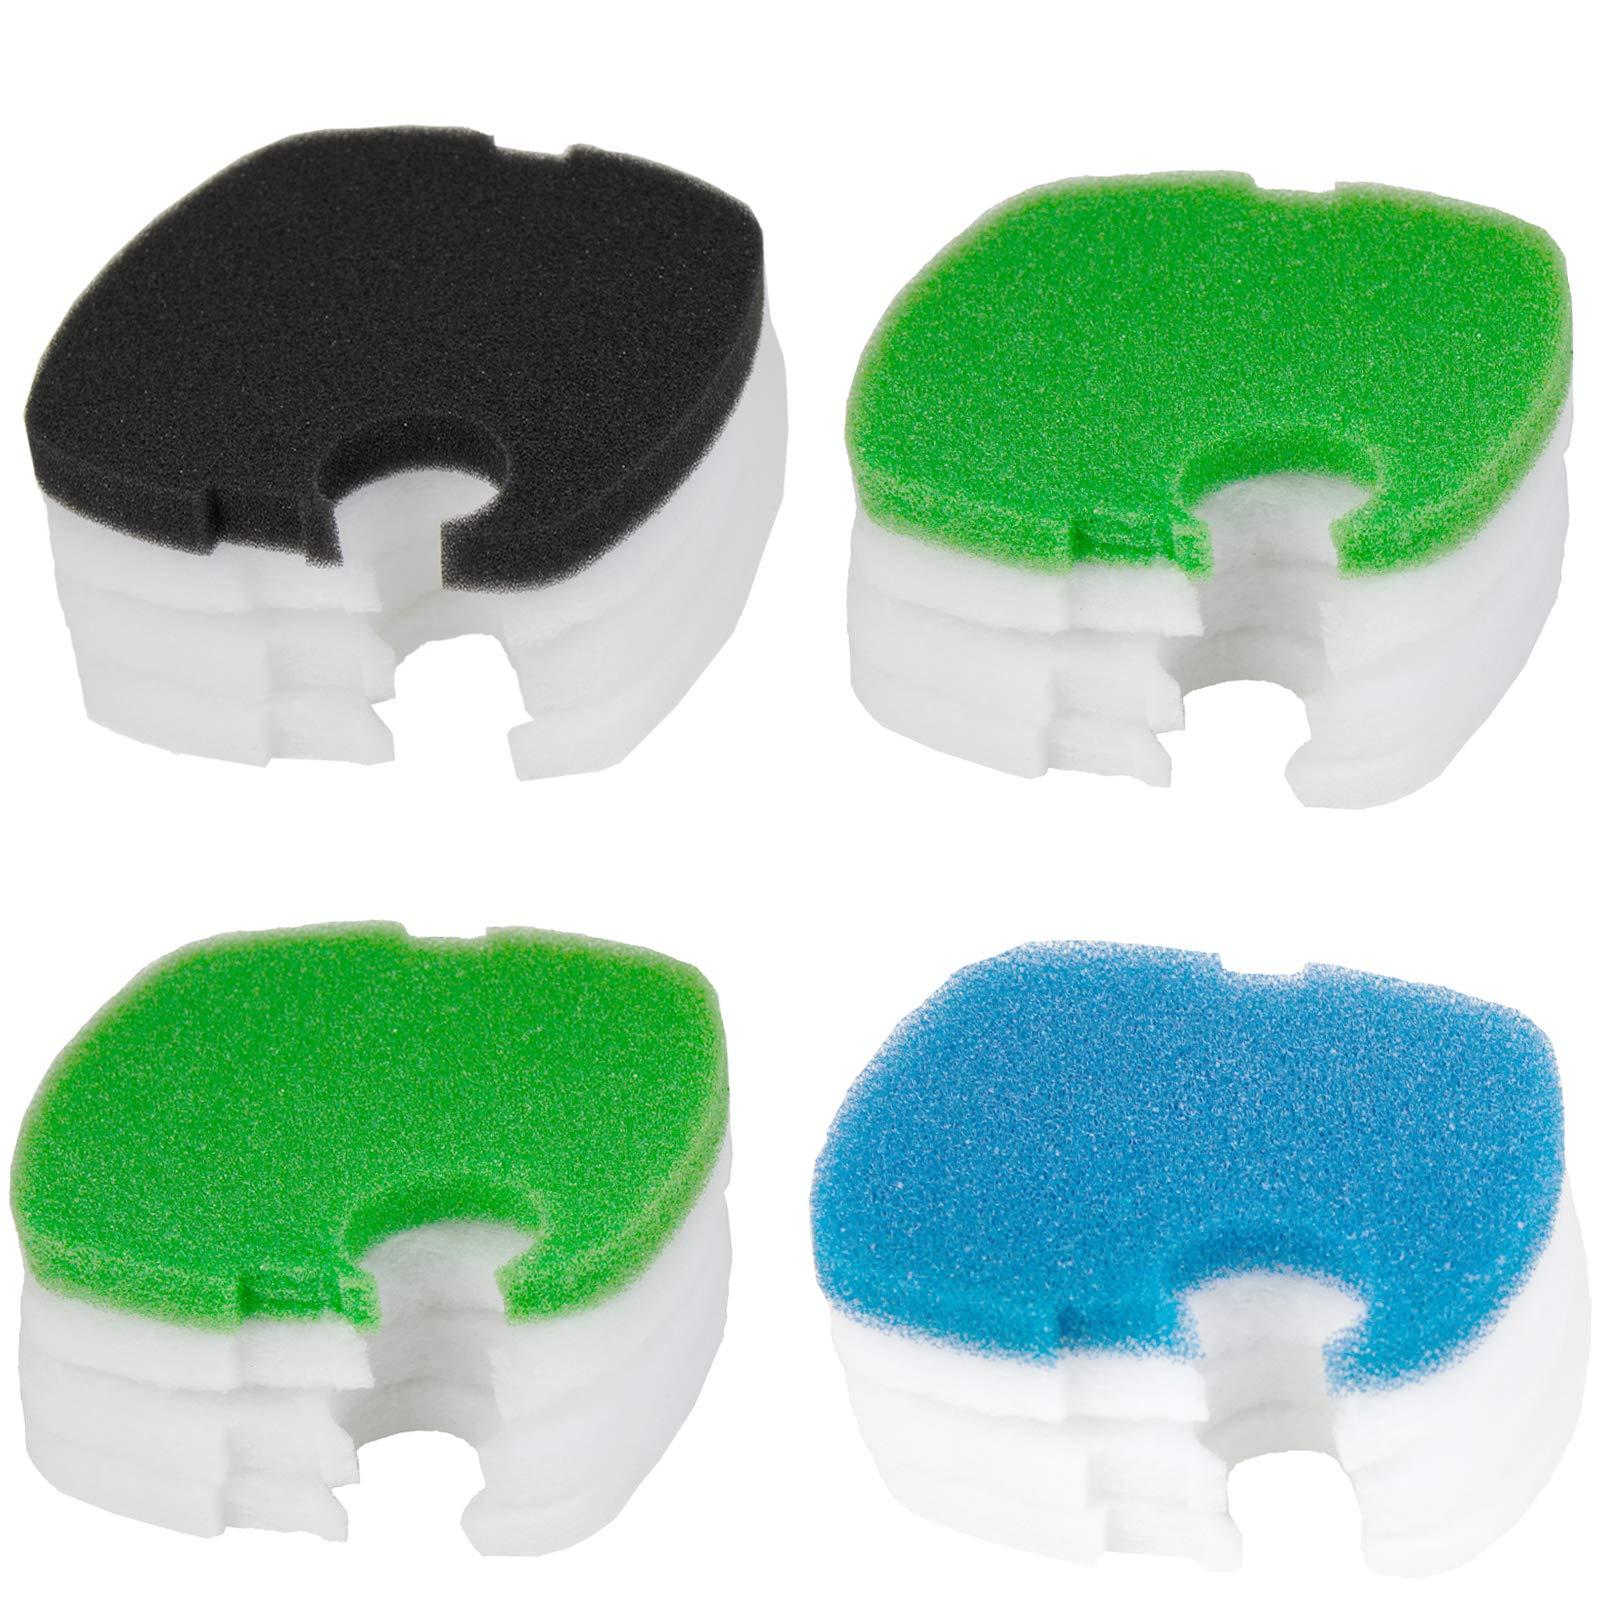 Aquaneat Aquarium Canister Filter Pads for SUNSUN HW-304B/404B/704B/3000 CF500 Polar Aurora Replacement Filter Pads Filter Media by Aquaneat